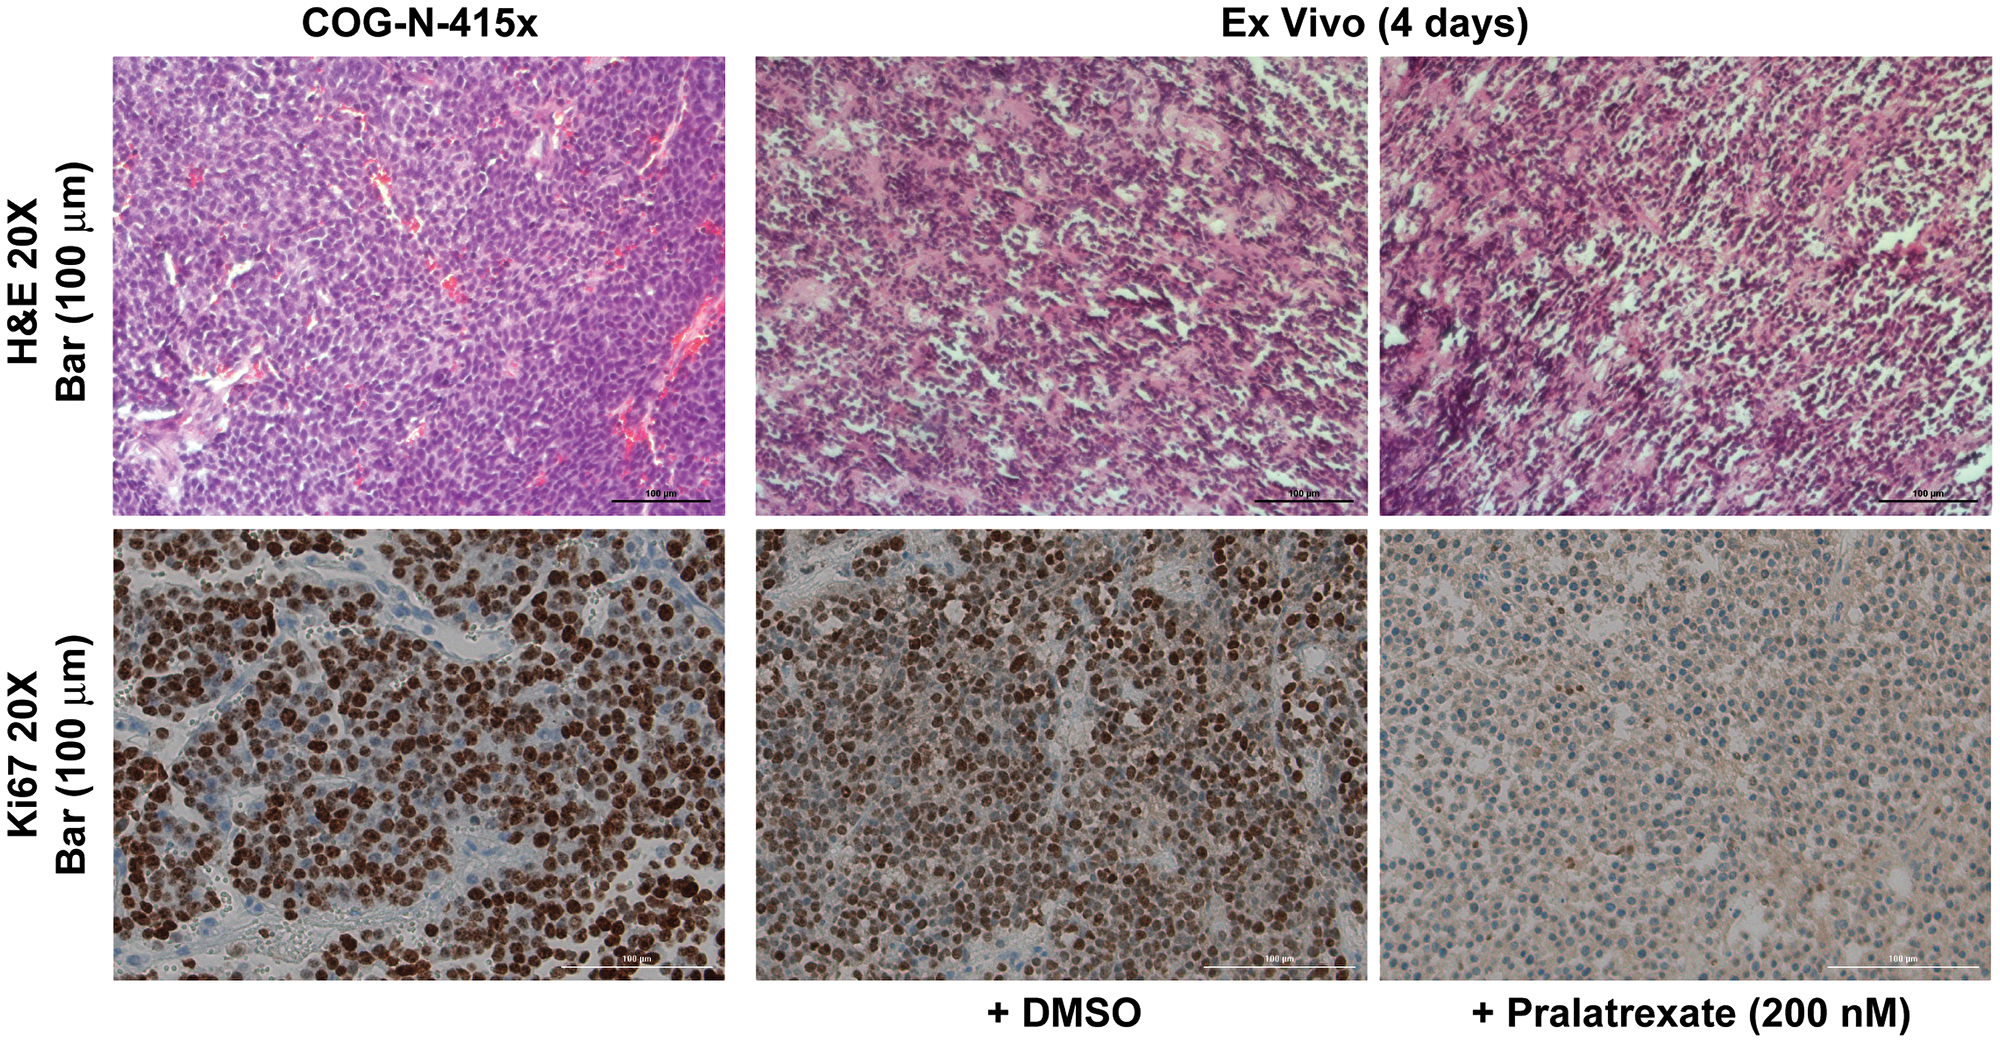 Ex vivo tissue culture model recapitulated antitumor response to pralatrexate.